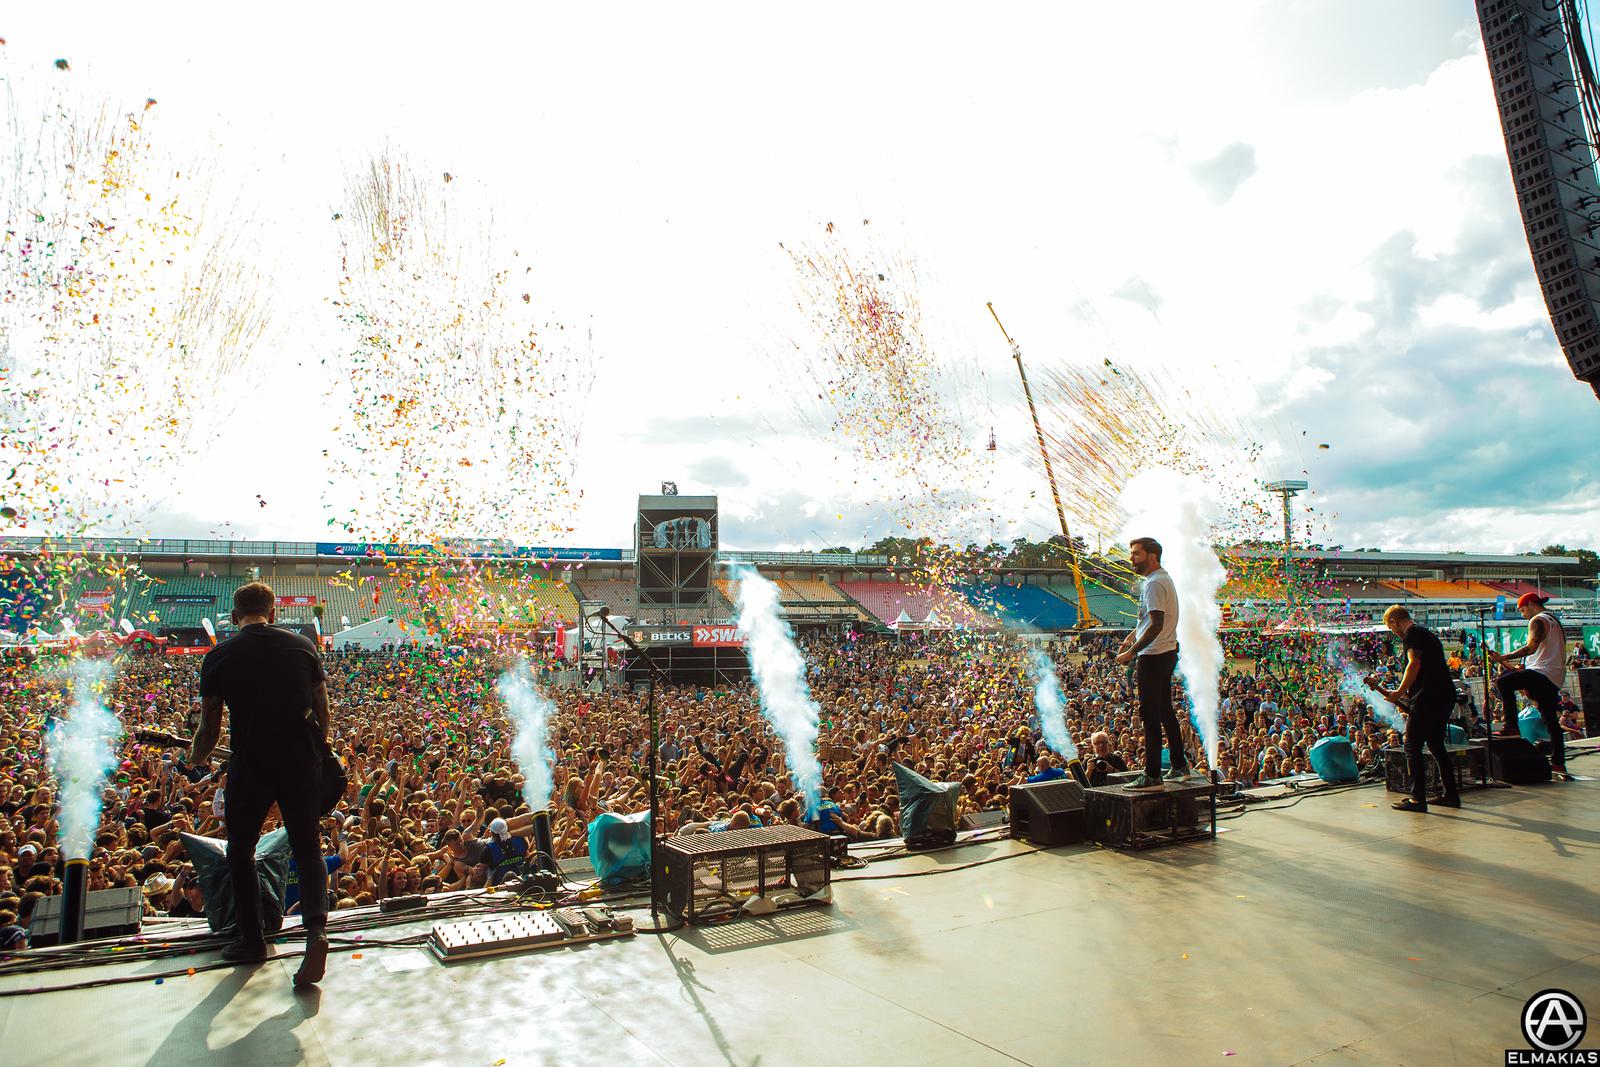 My favorite photos! Confetti shots